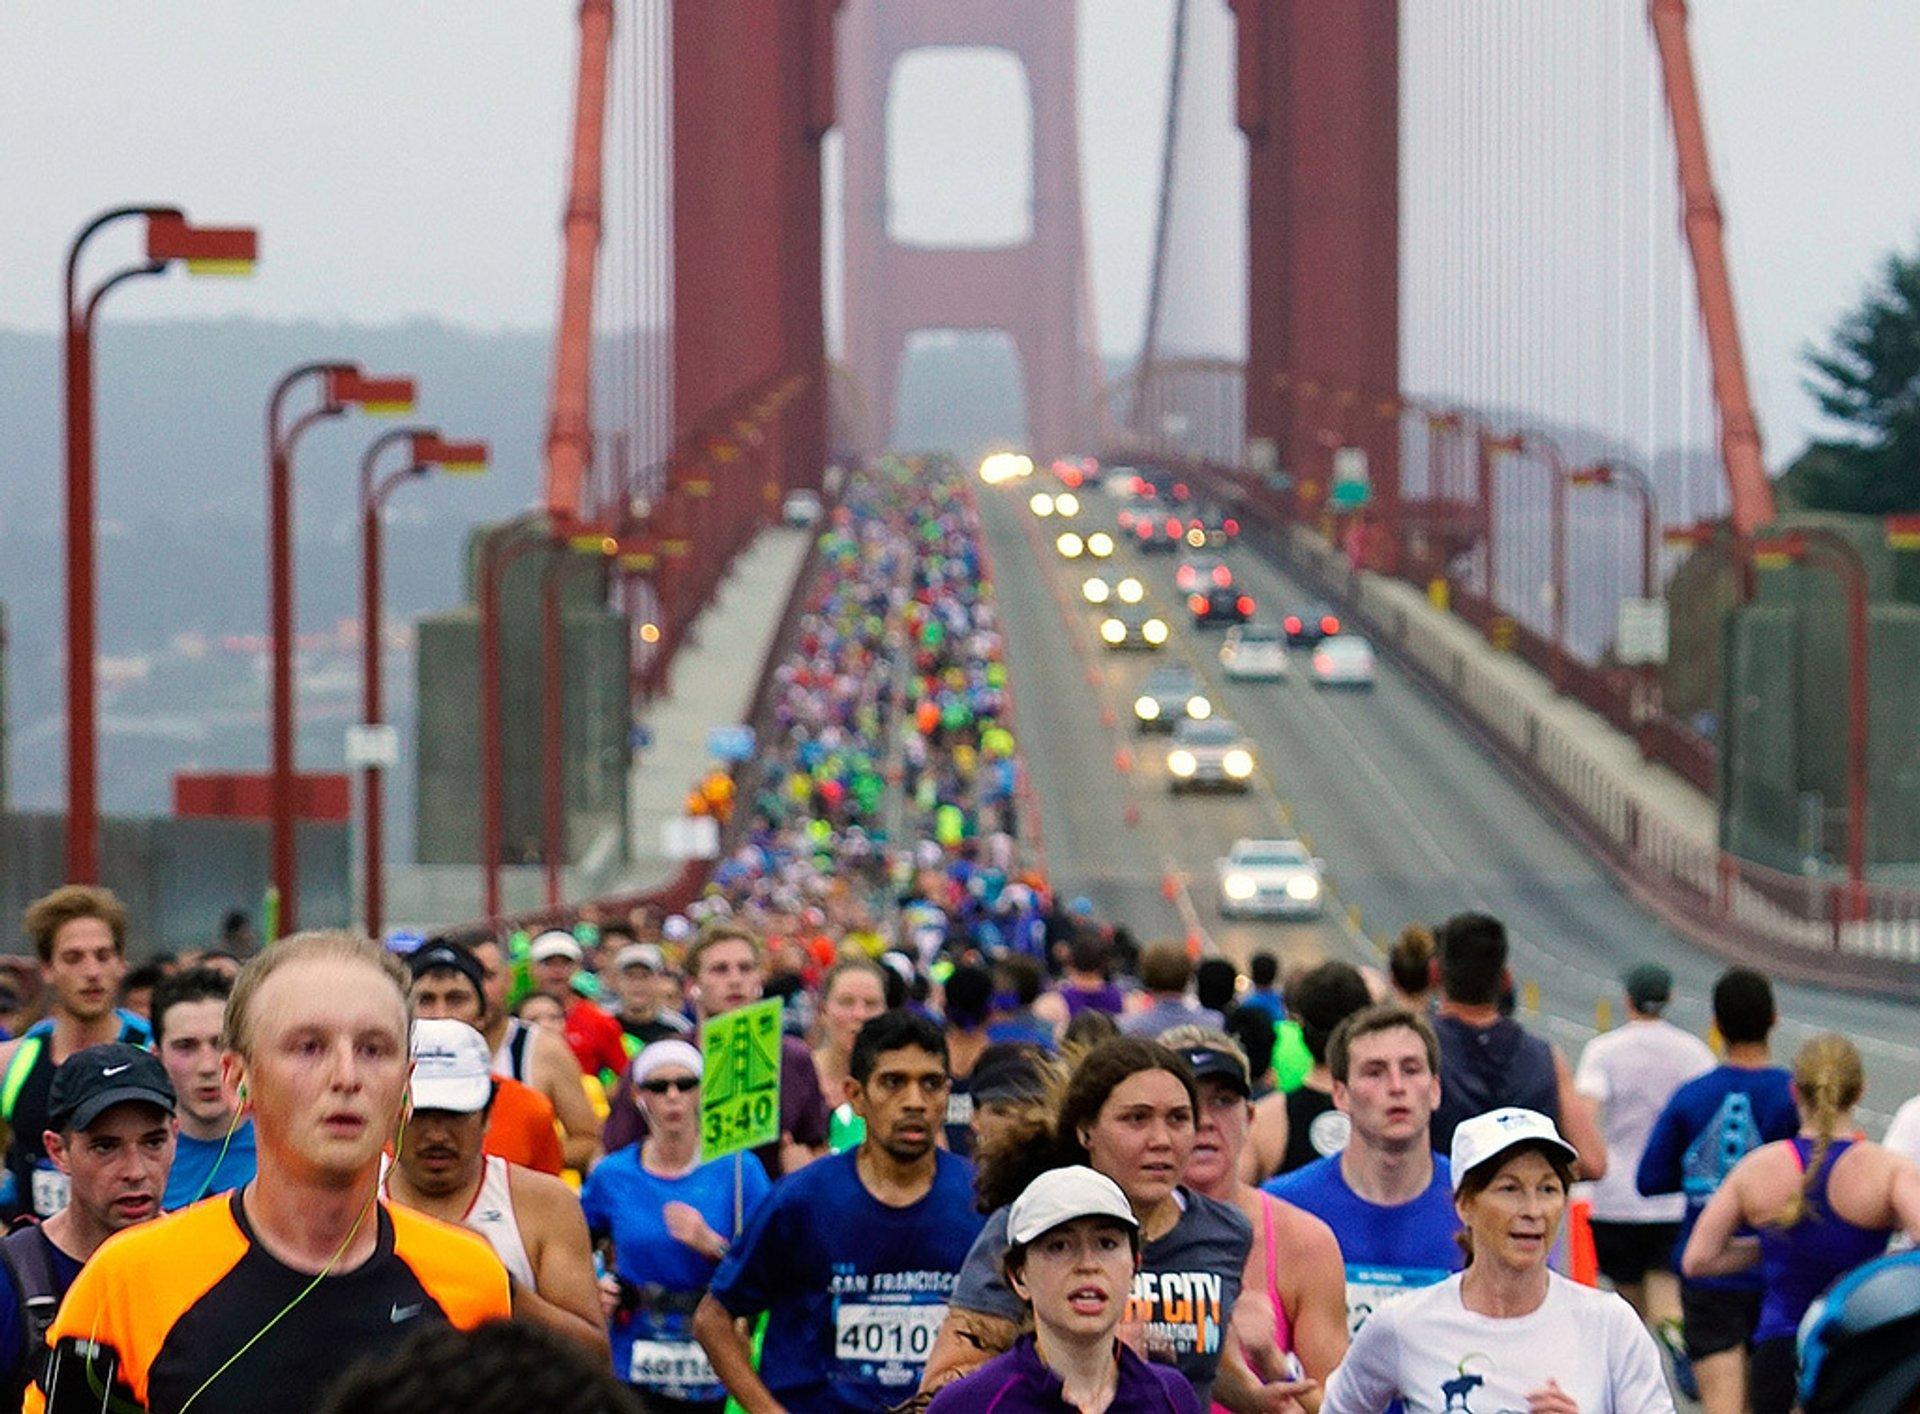 San Francisco Marathon in San Francisco - Best Season 2019